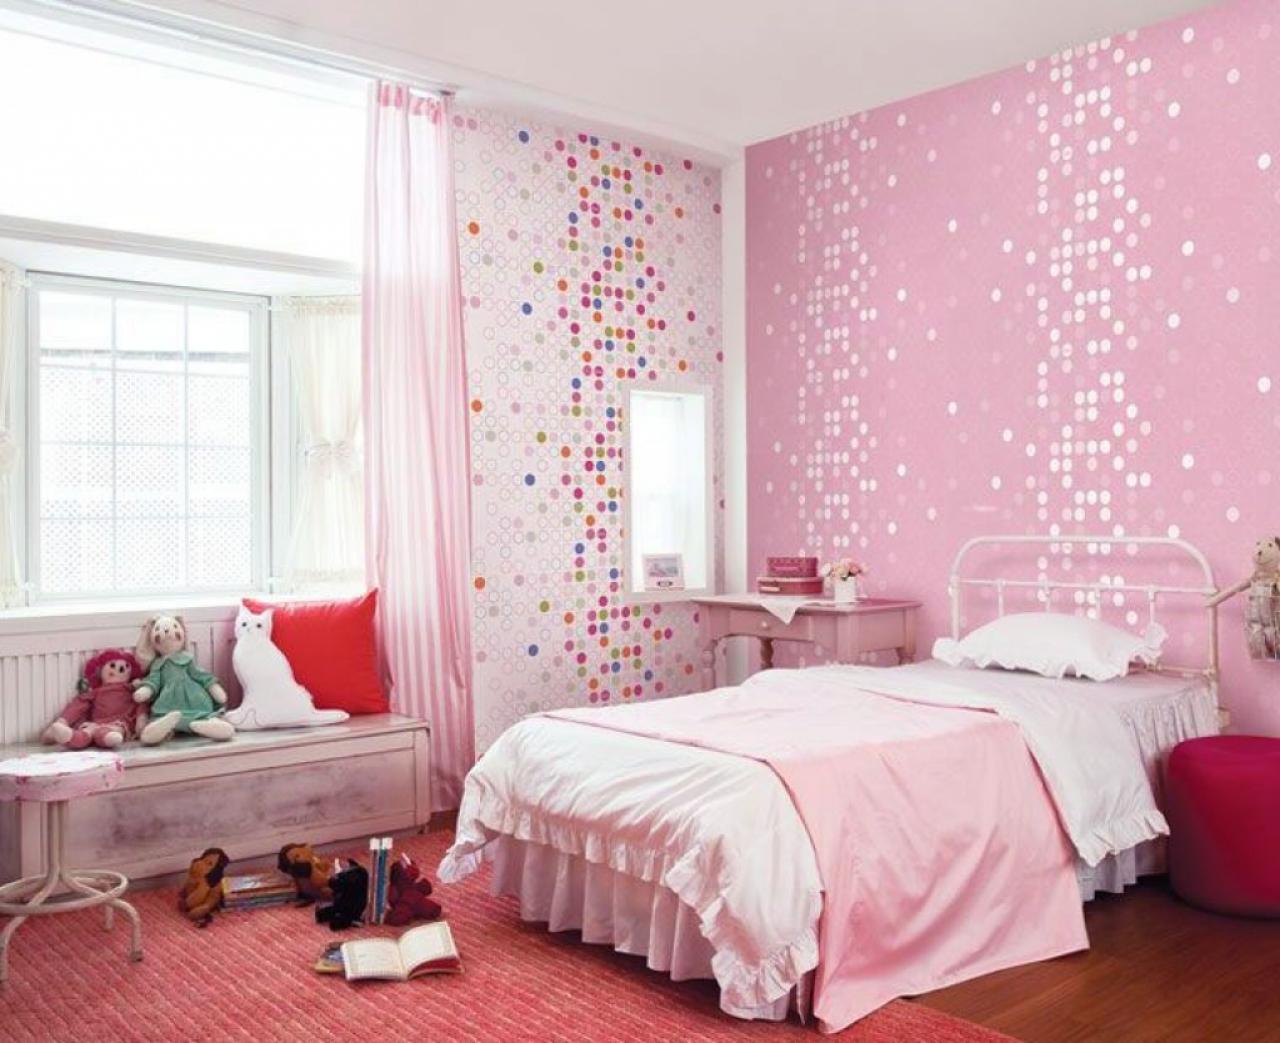 Free download girls bedroom home design Kids room cute pink ...